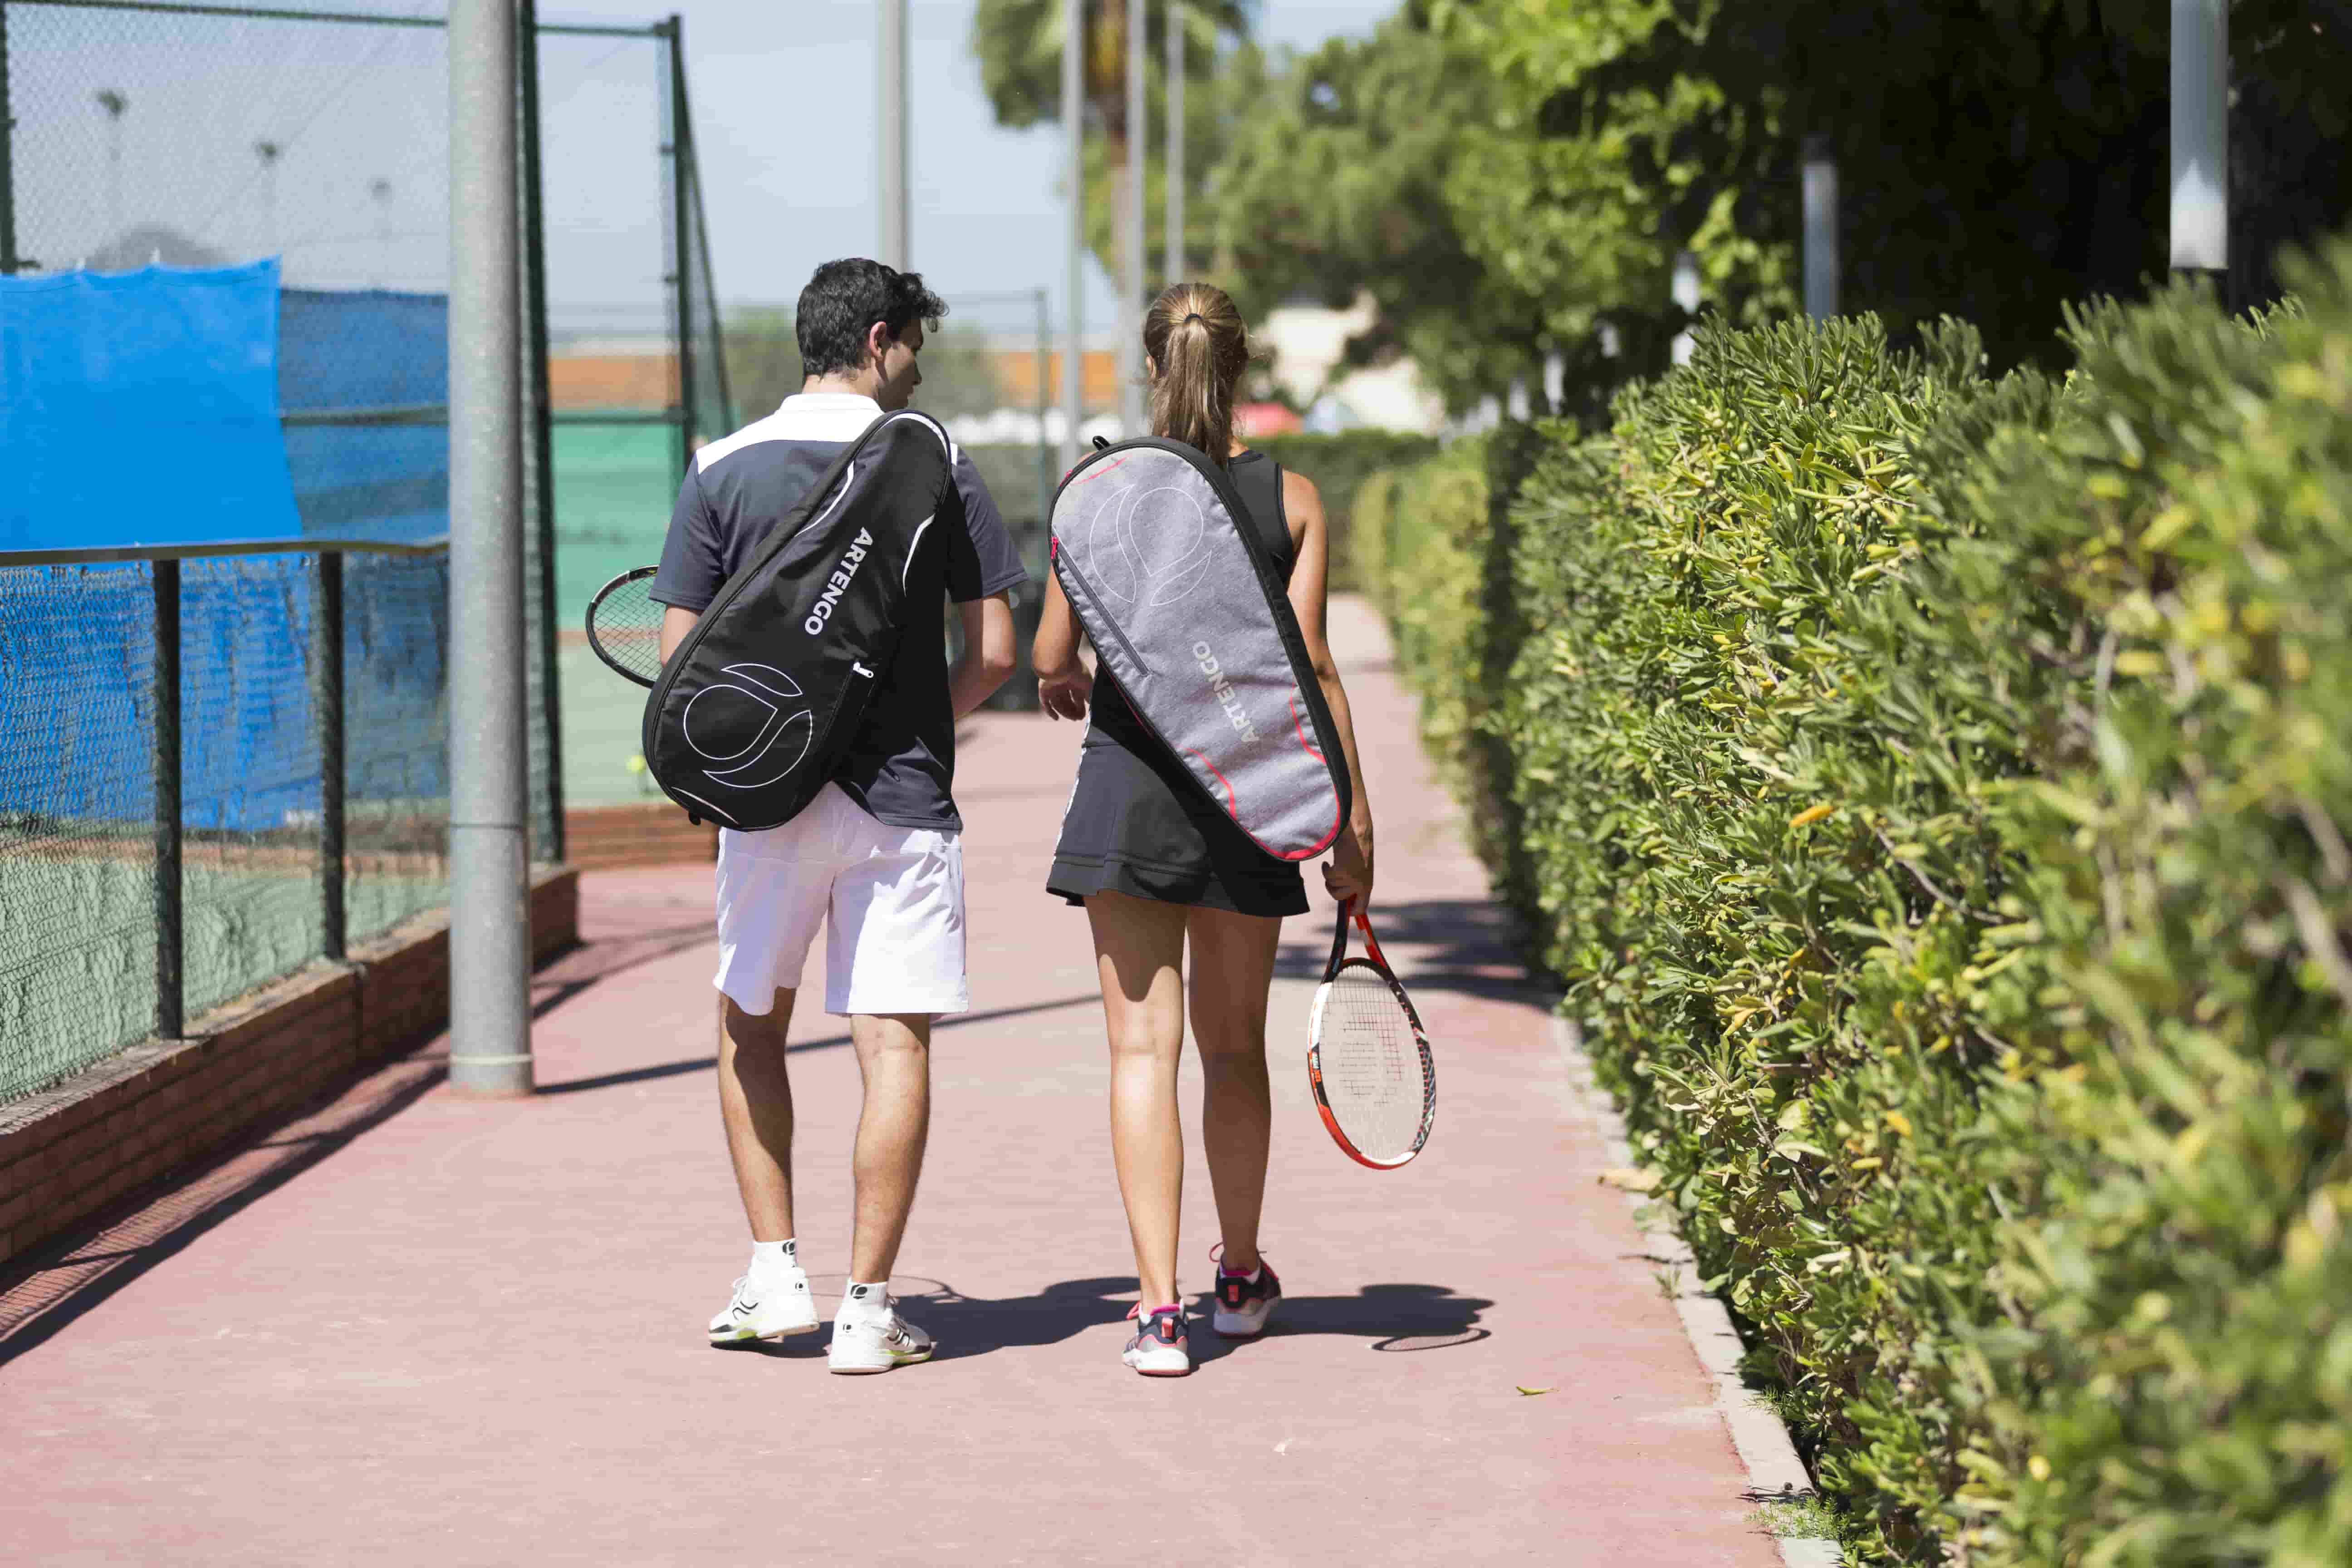 How to Choose a Tennis Bag